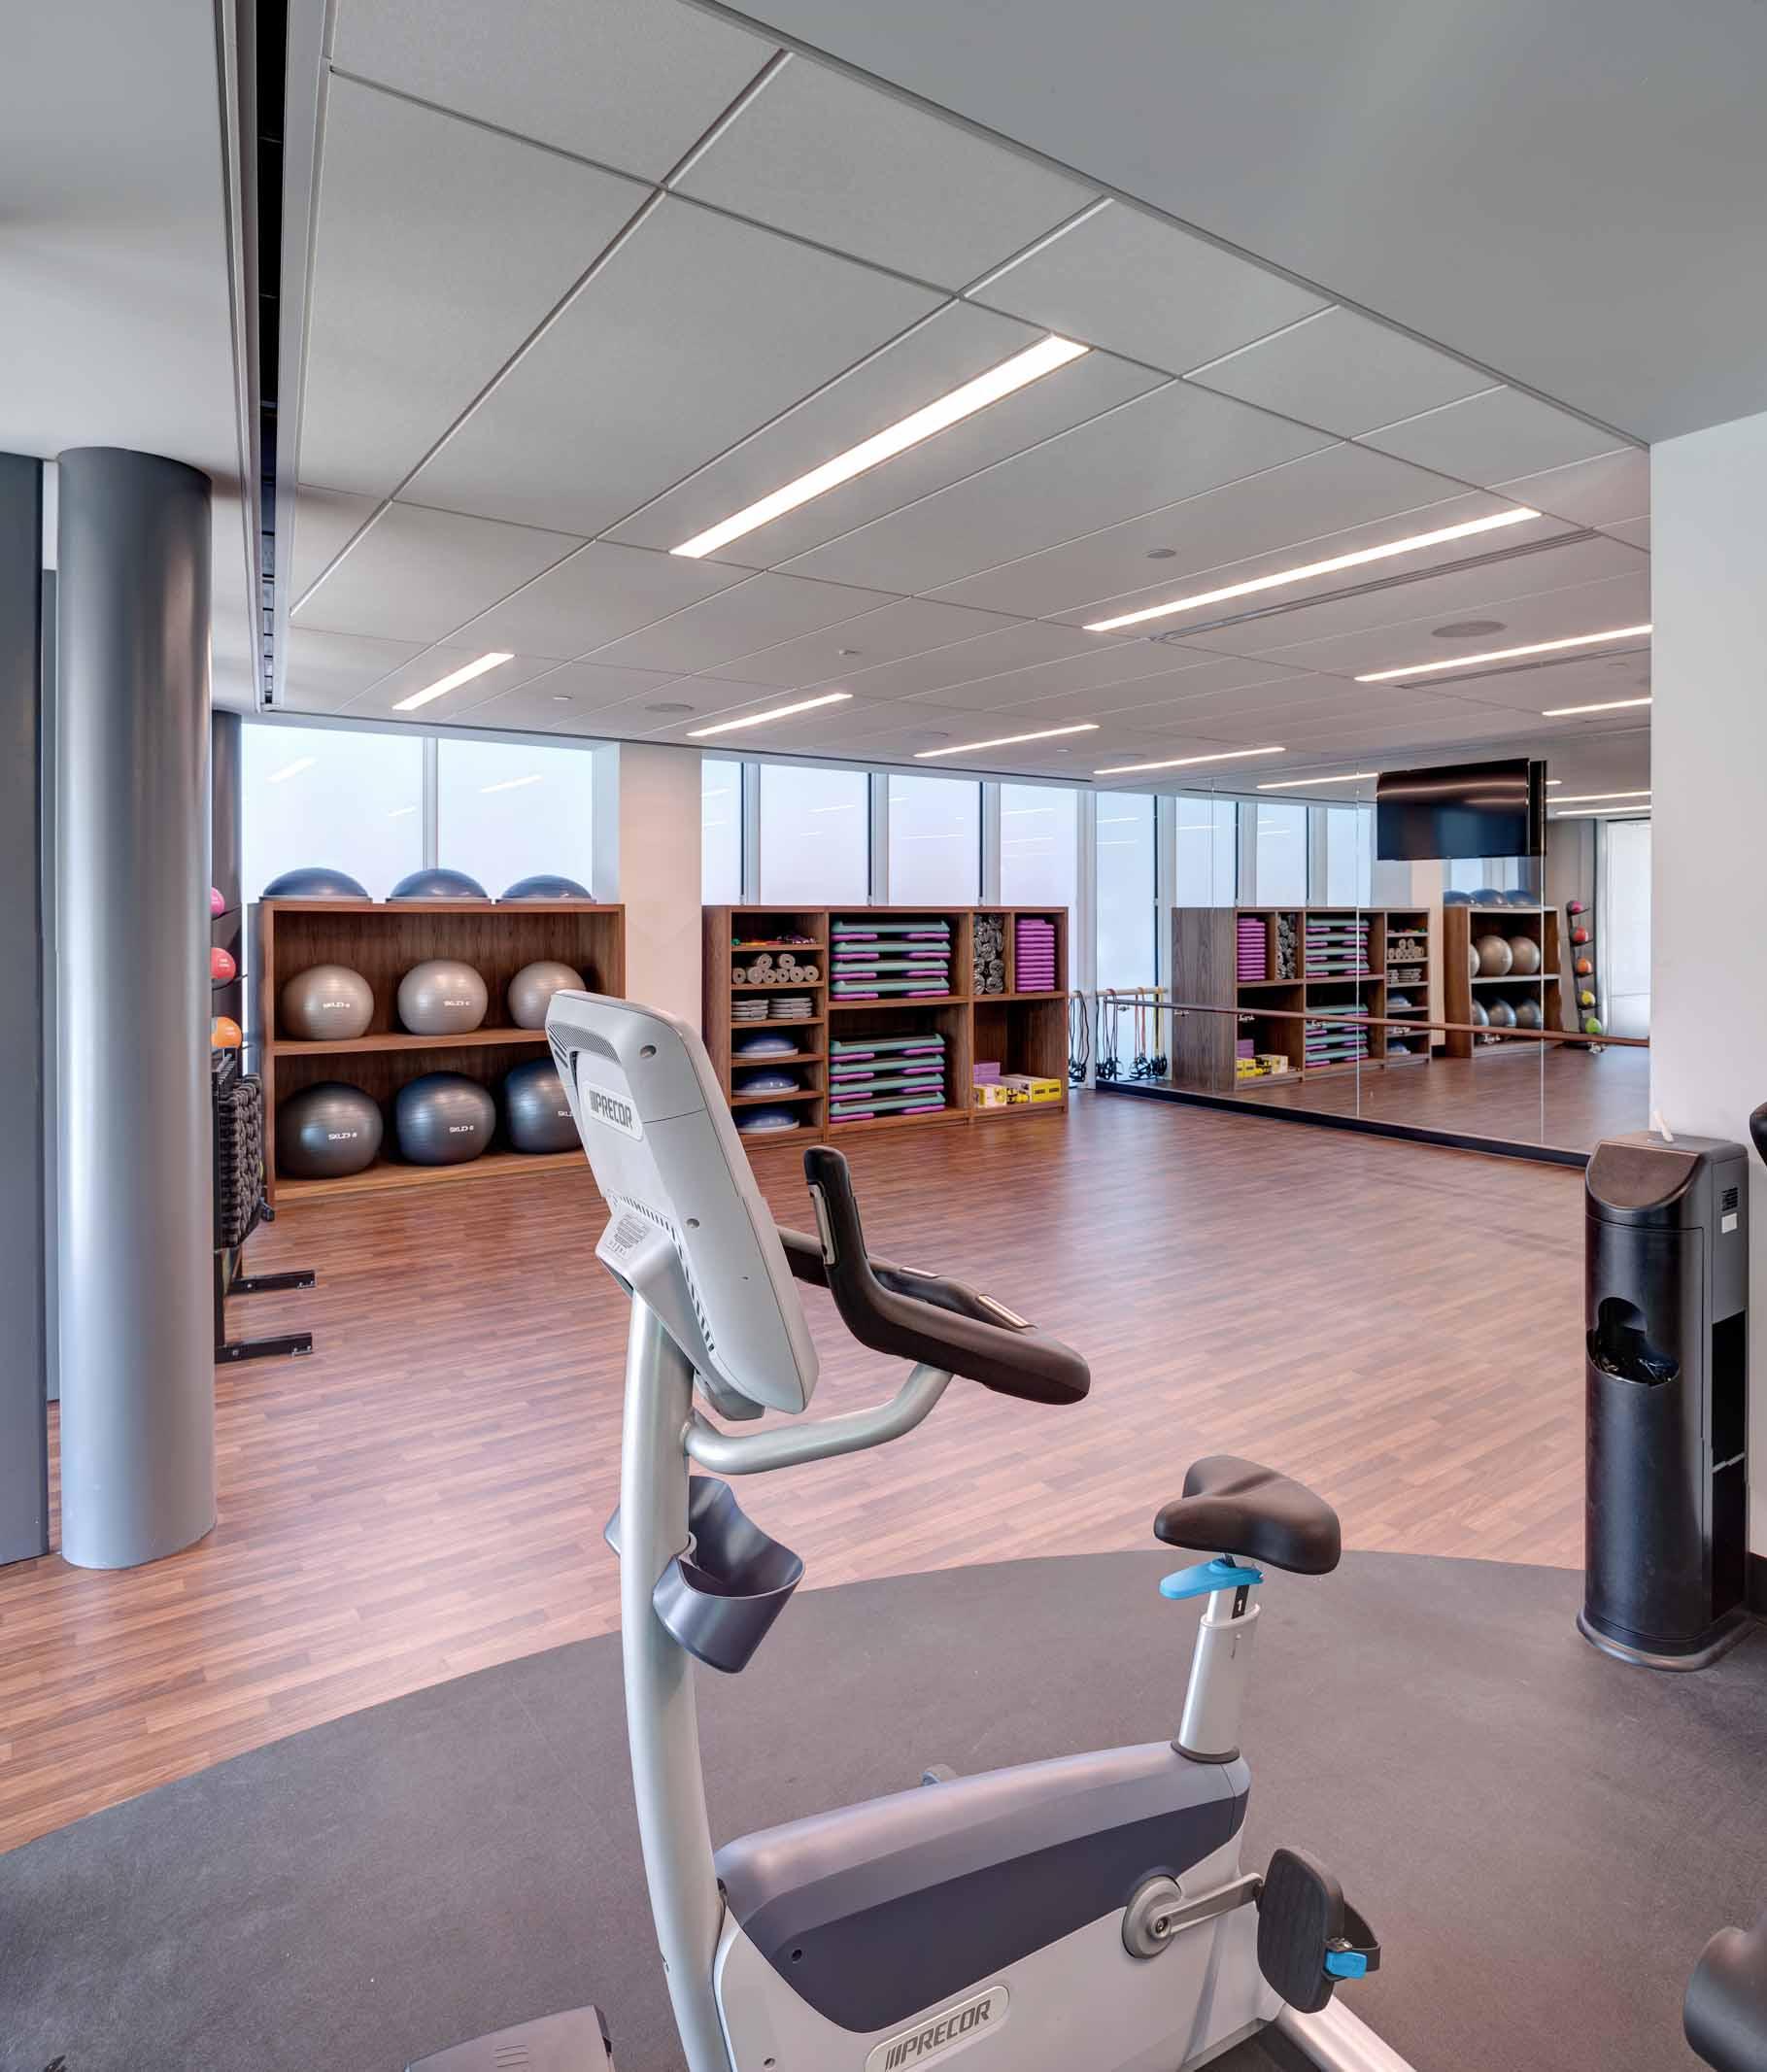 1stFloor-FitnessCenter-9971-ConsumersCreditUnion-QuarterSize[1].jpg